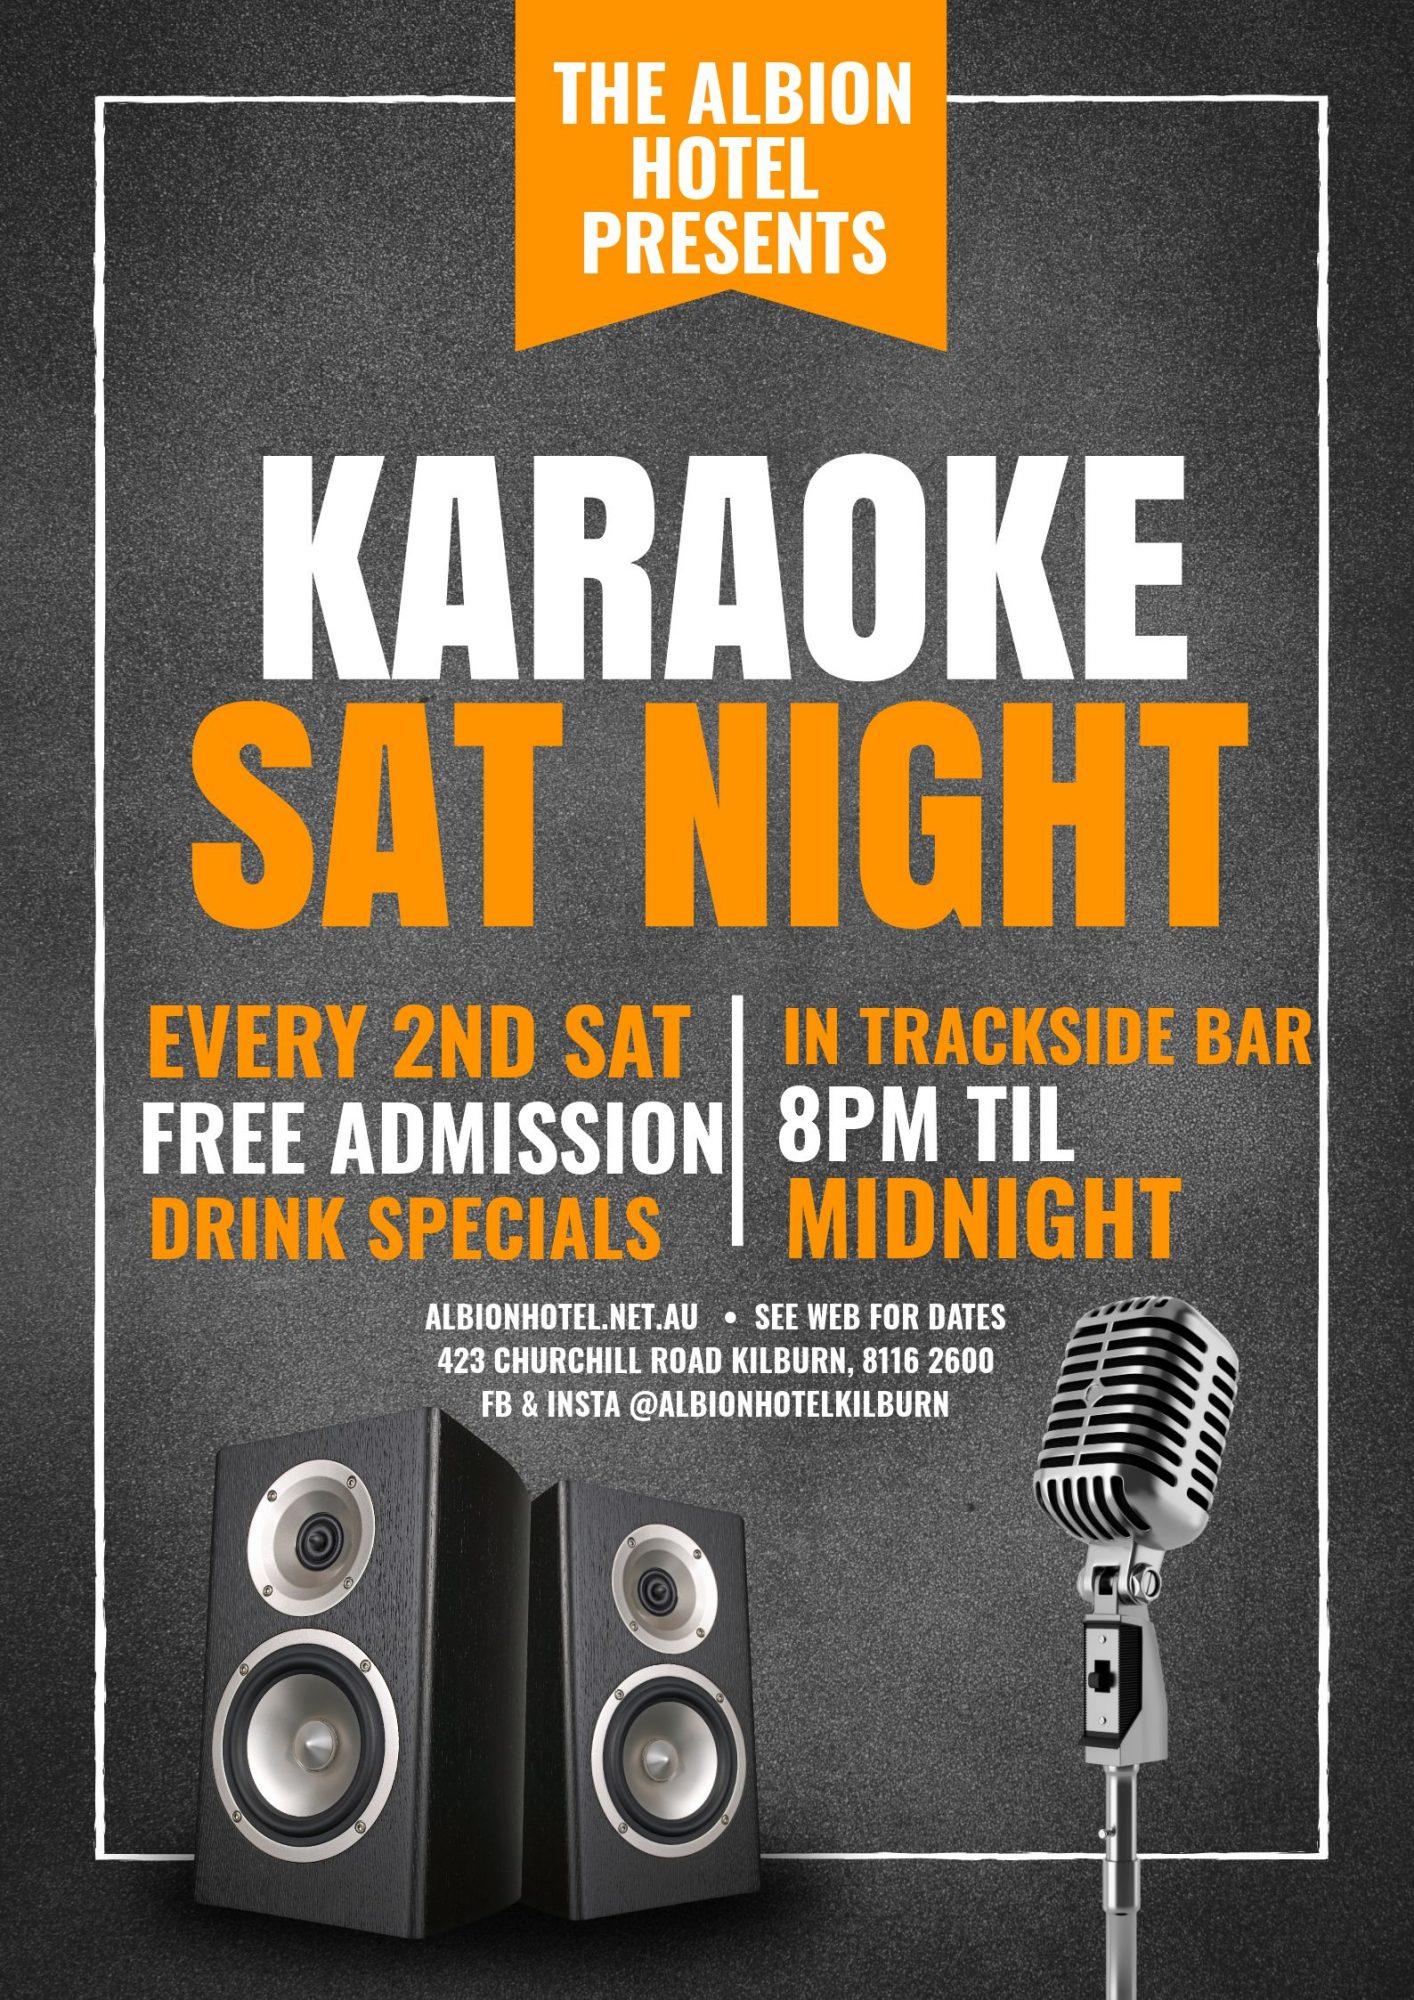 Karoke – LIVE FROM 8PM